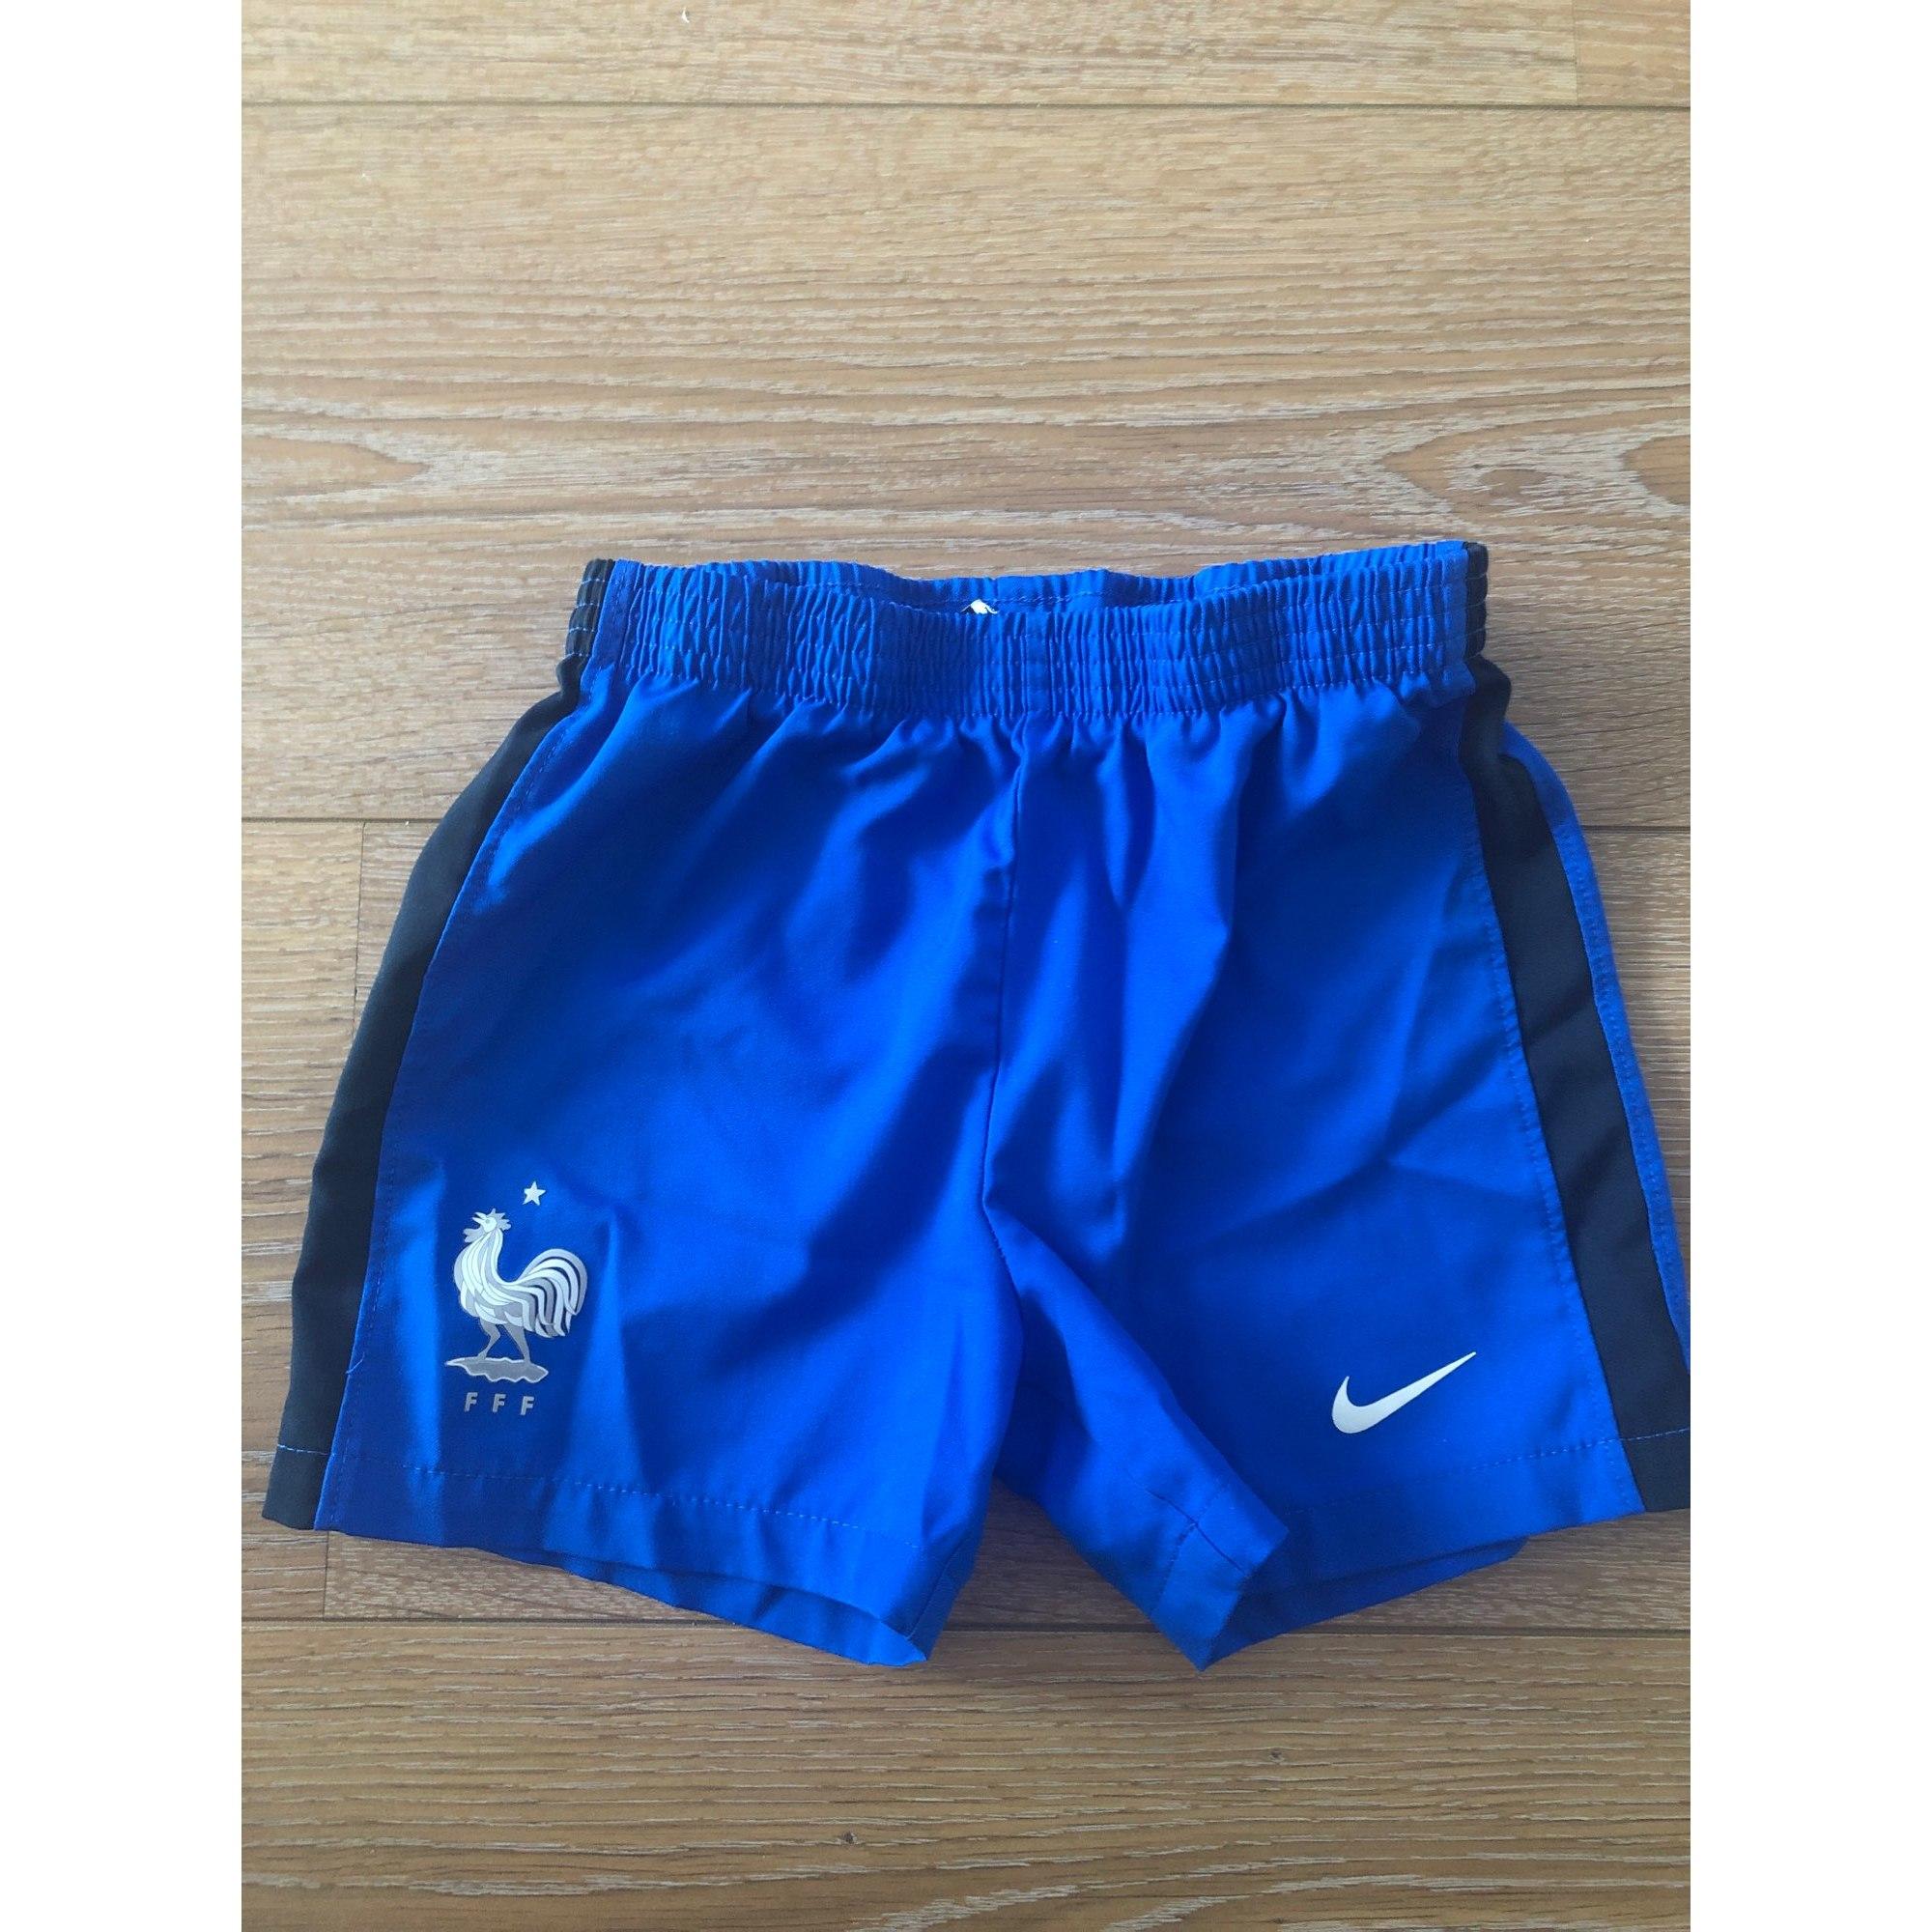 Short NIKE Bleu, bleu marine, bleu turquoise